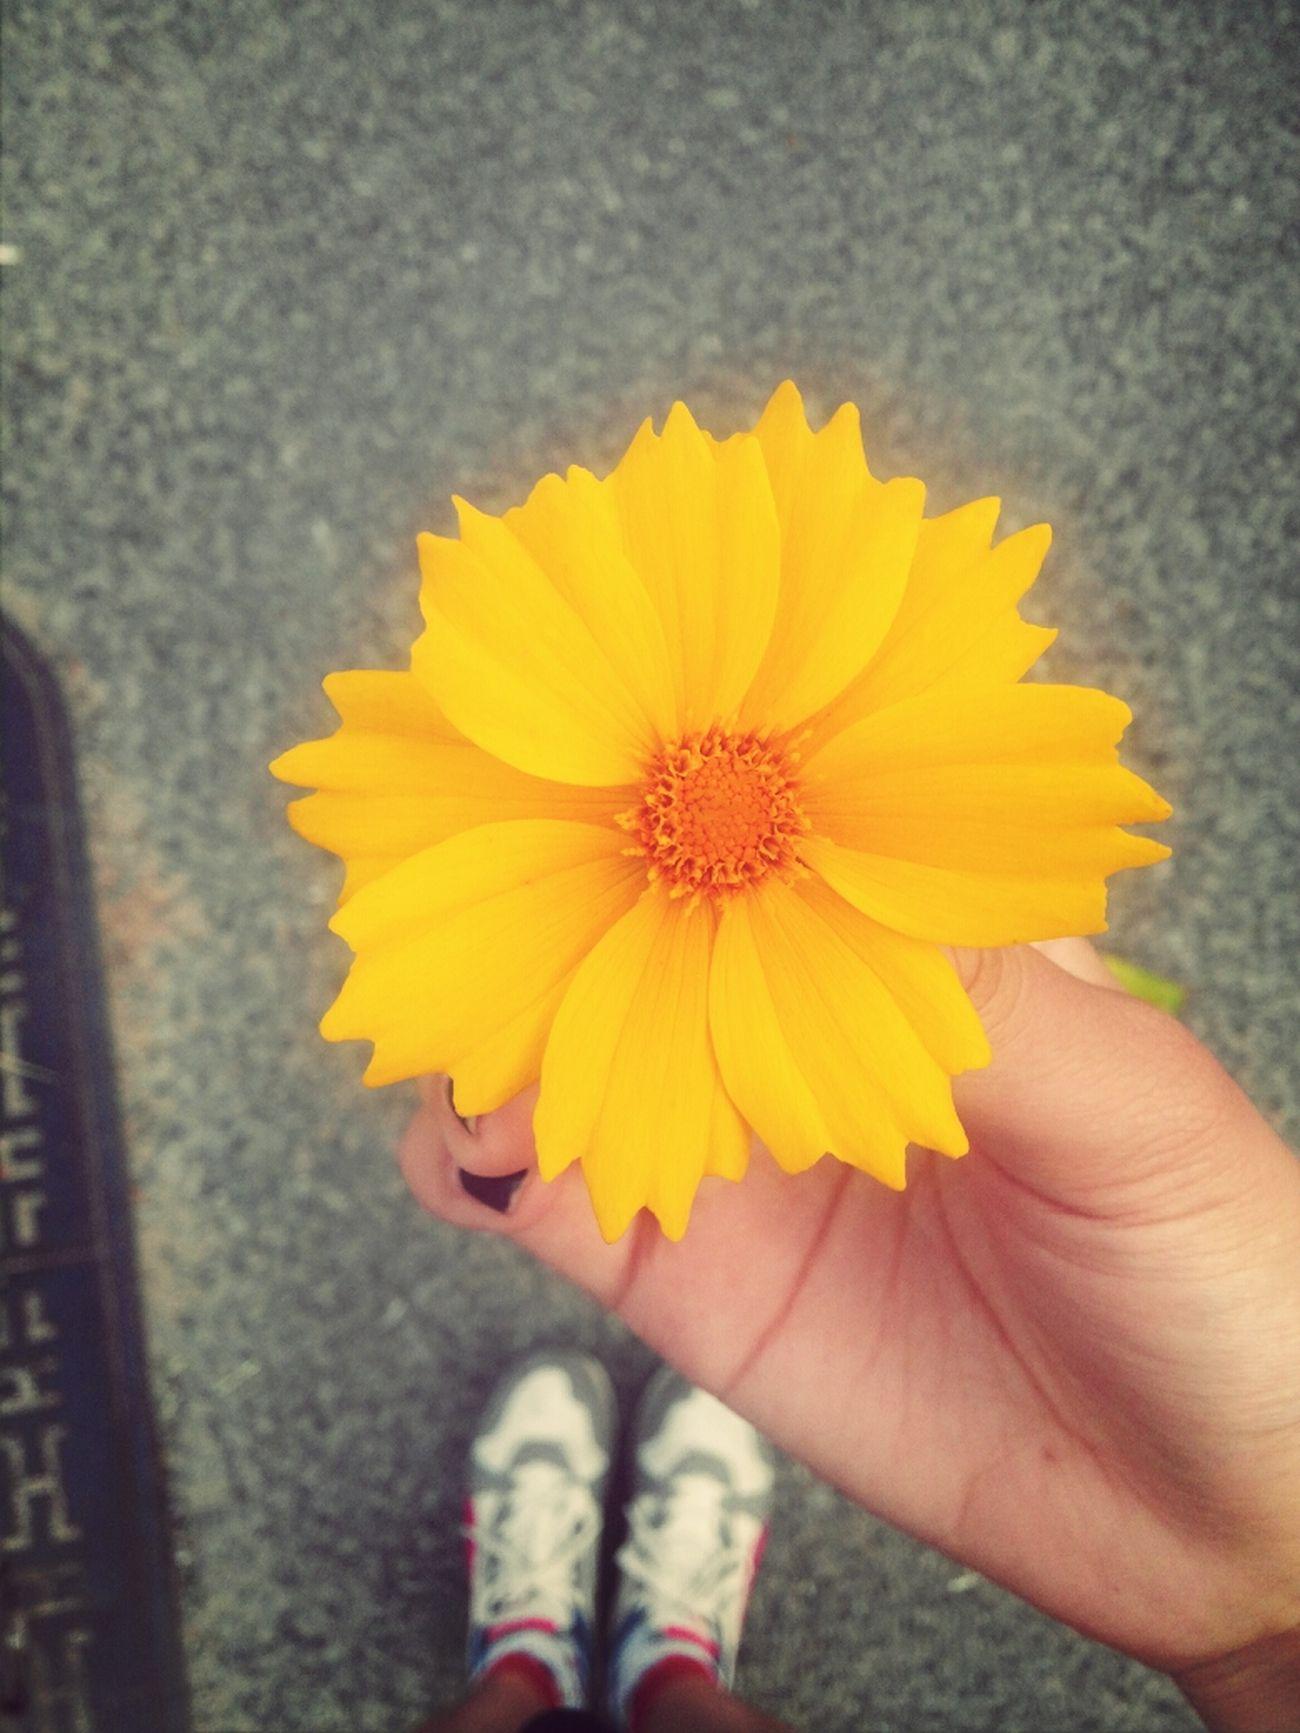 Flower Take Me Thank You With My Lover💕 현장견습 다녀오는 길에 내 생각 나서 가져온 선물??작은 꽃 하나지만 그 감동은 어느 꽃다발보다 더 크넹;> 고마워 내 사랑 hj ;) 사랑합니동??